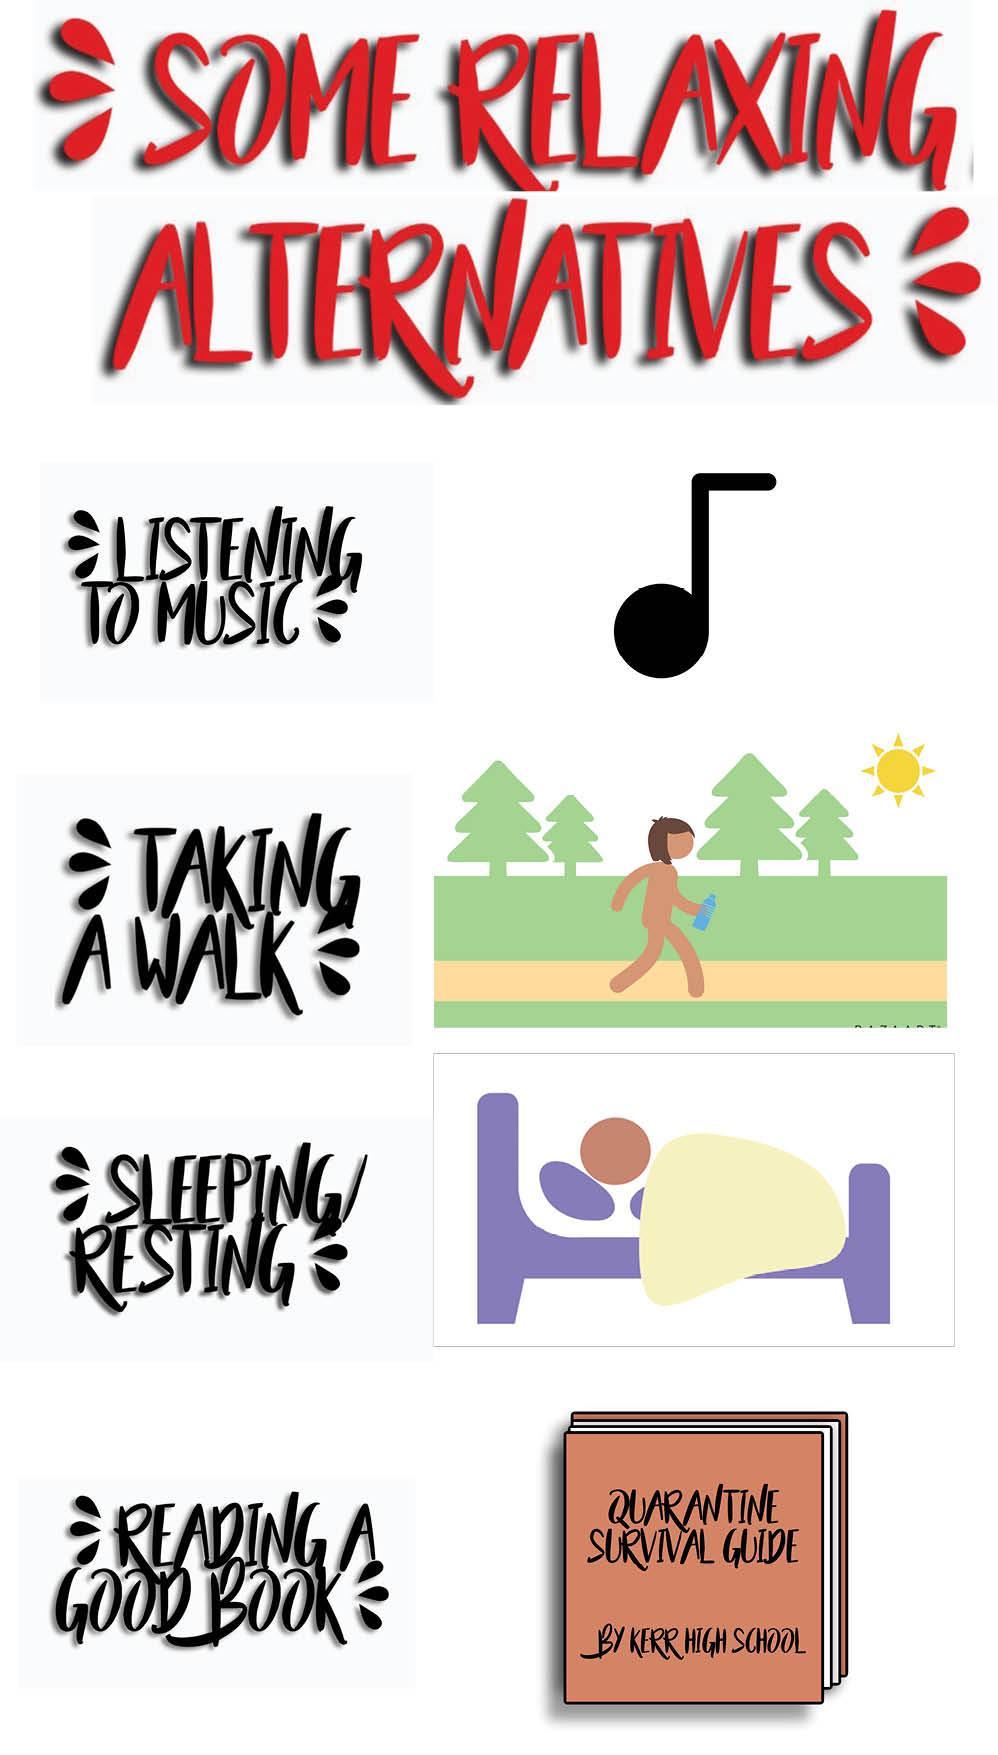 Relaxing Alternatives